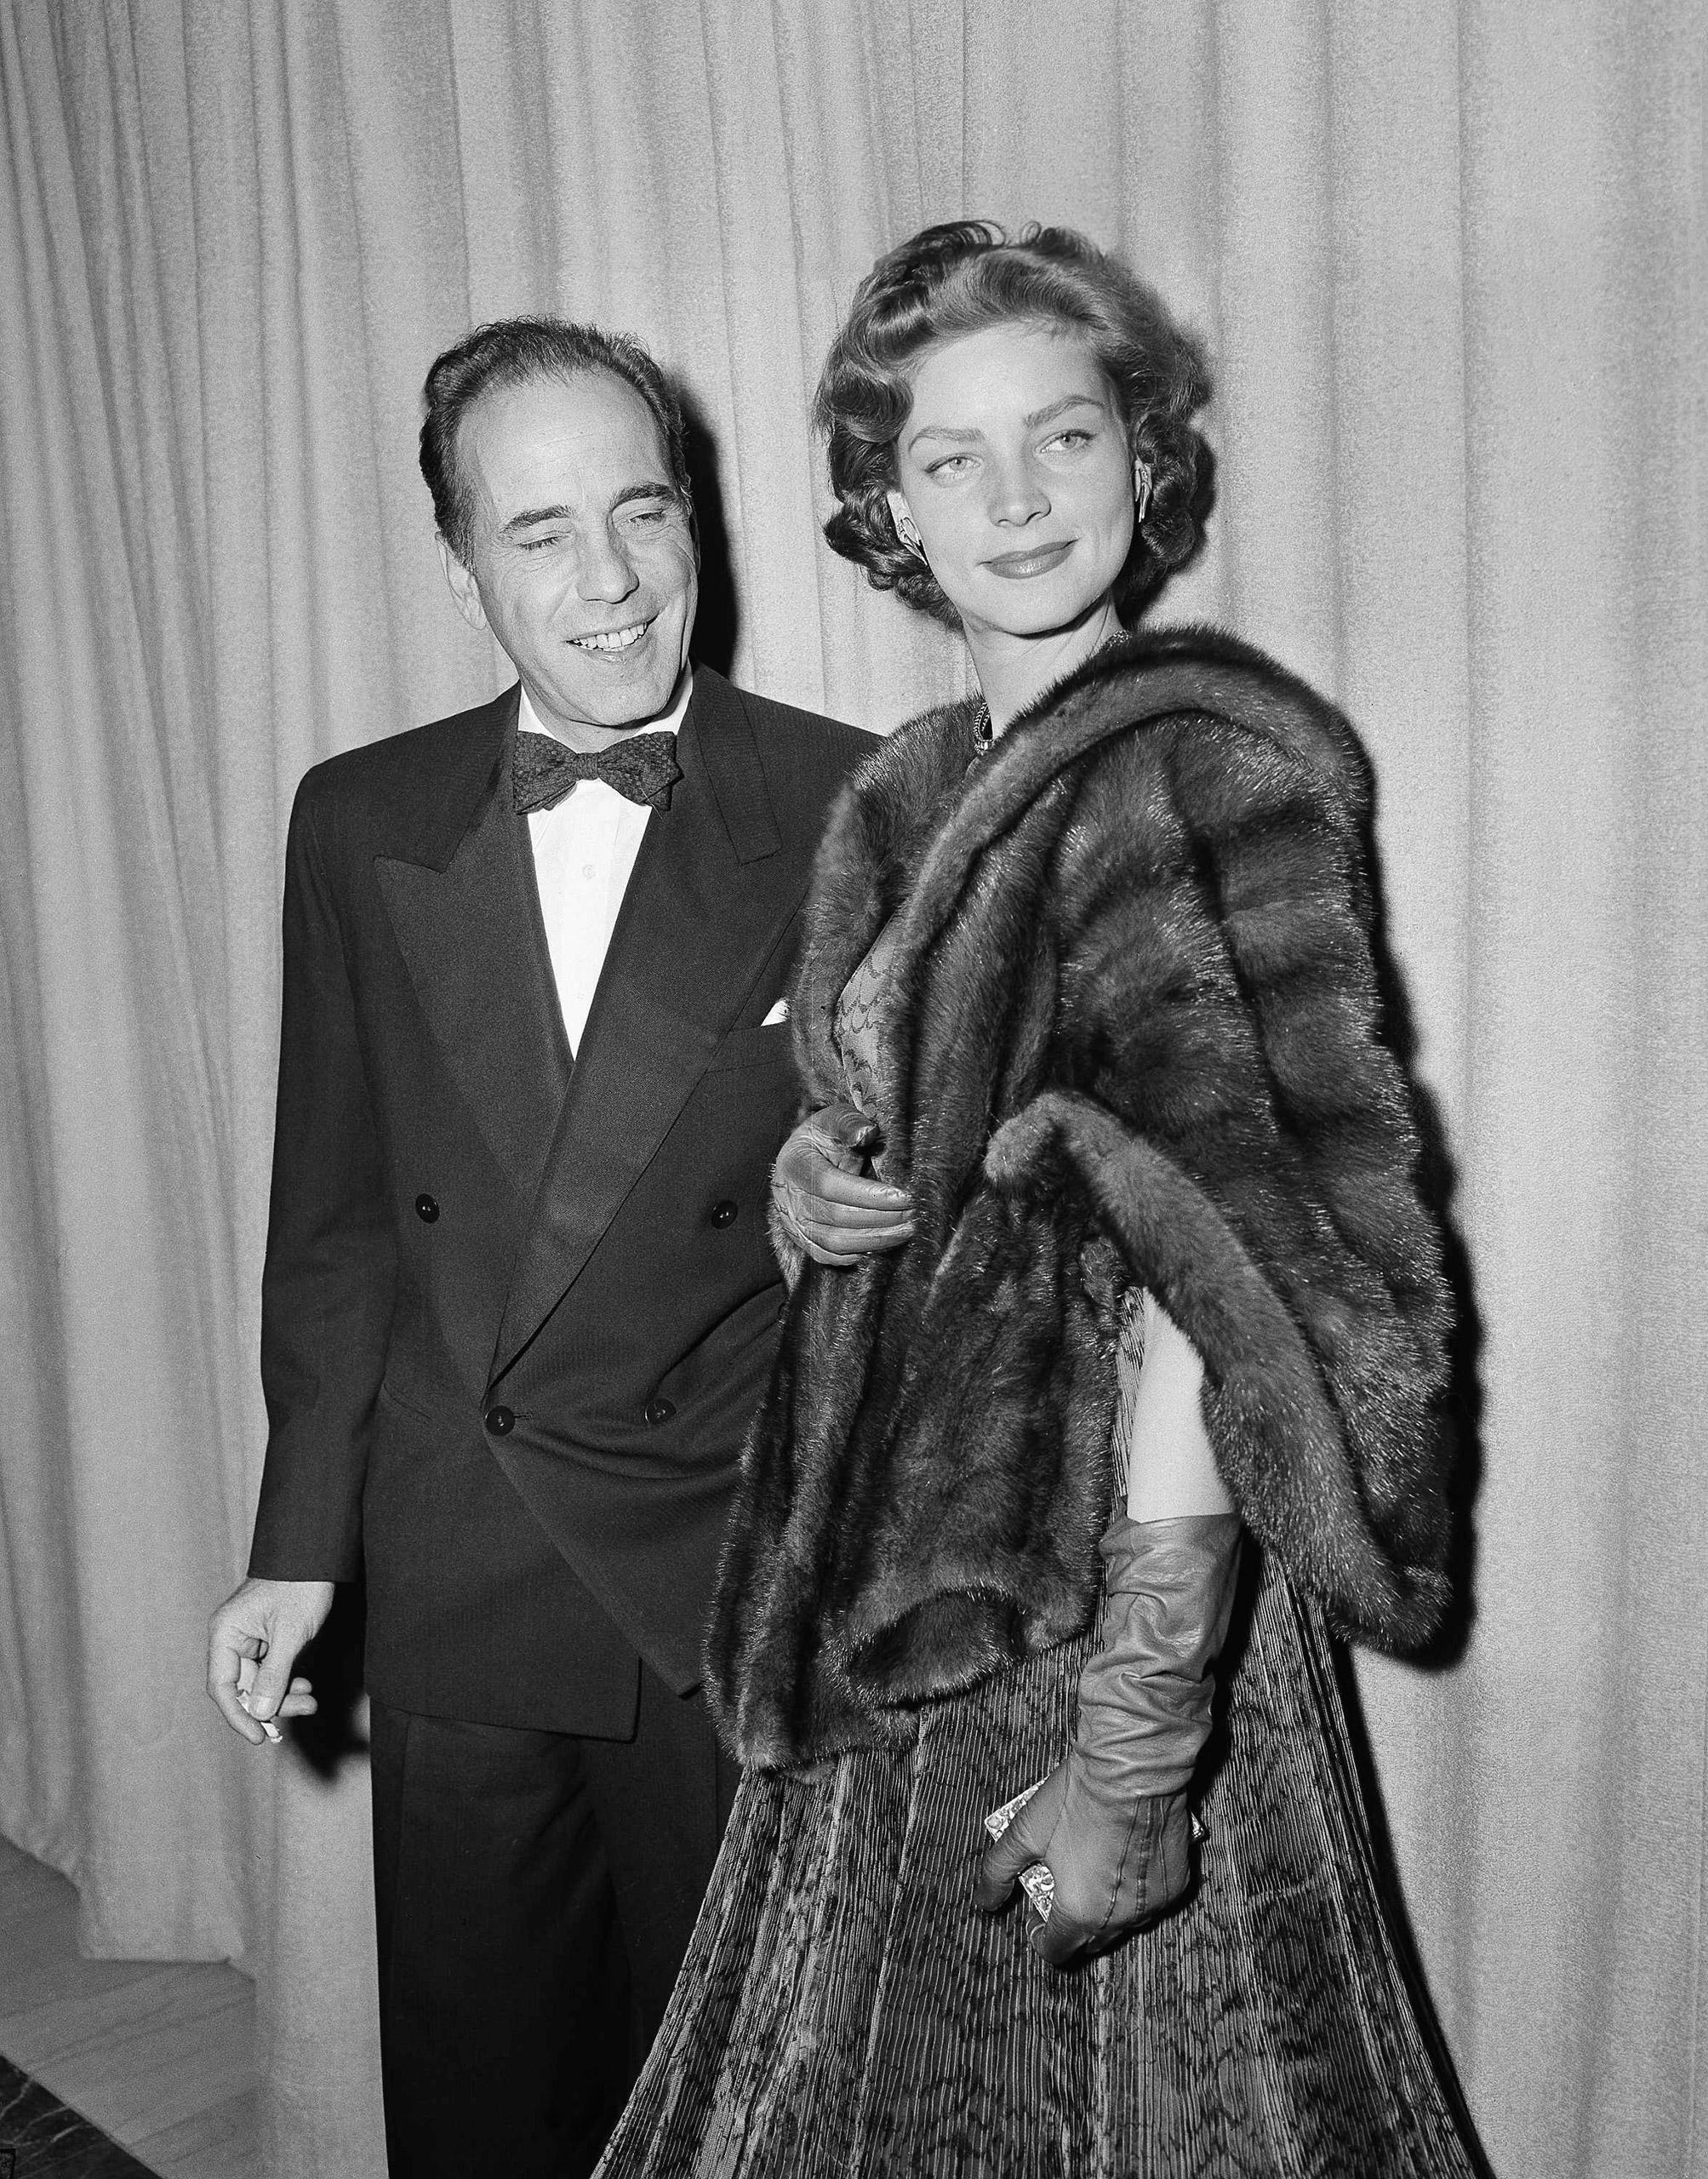 Humphrey Bogart and Lauren Bacall at the Academy Awards, 1952.